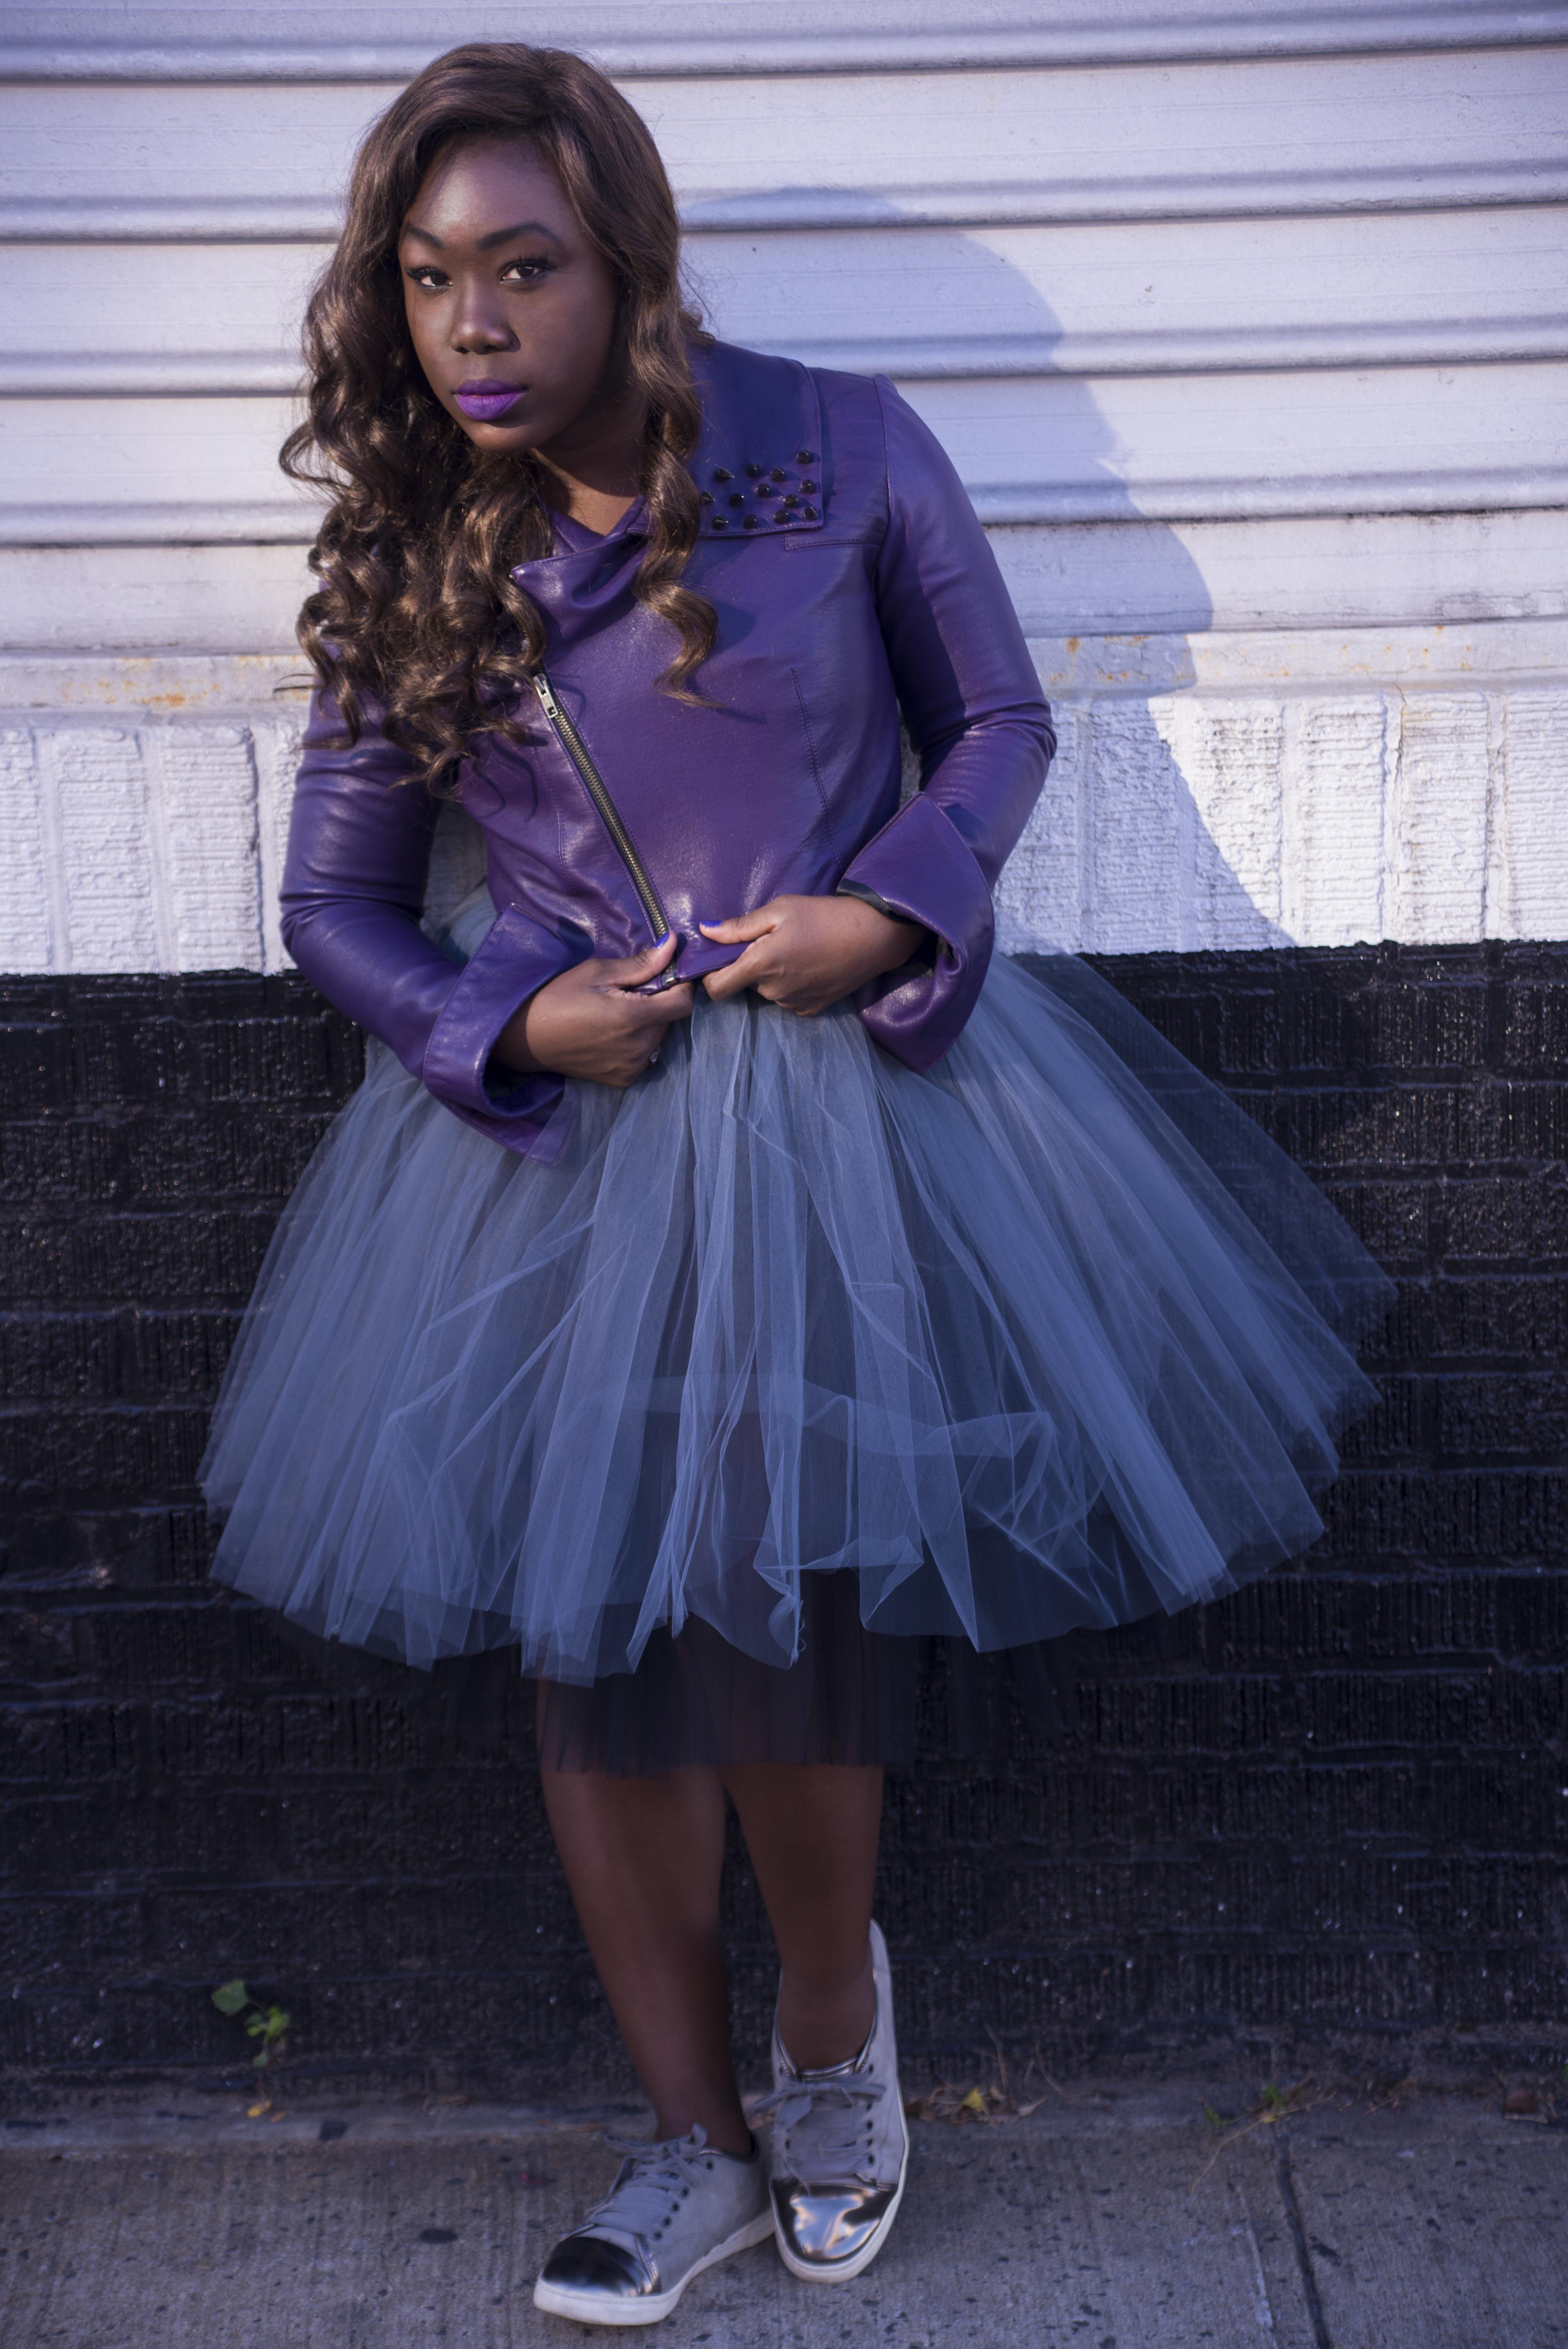 PMPhotography_MalindaKnowles_Blog_PurpleJacket_FullLengthPortrait